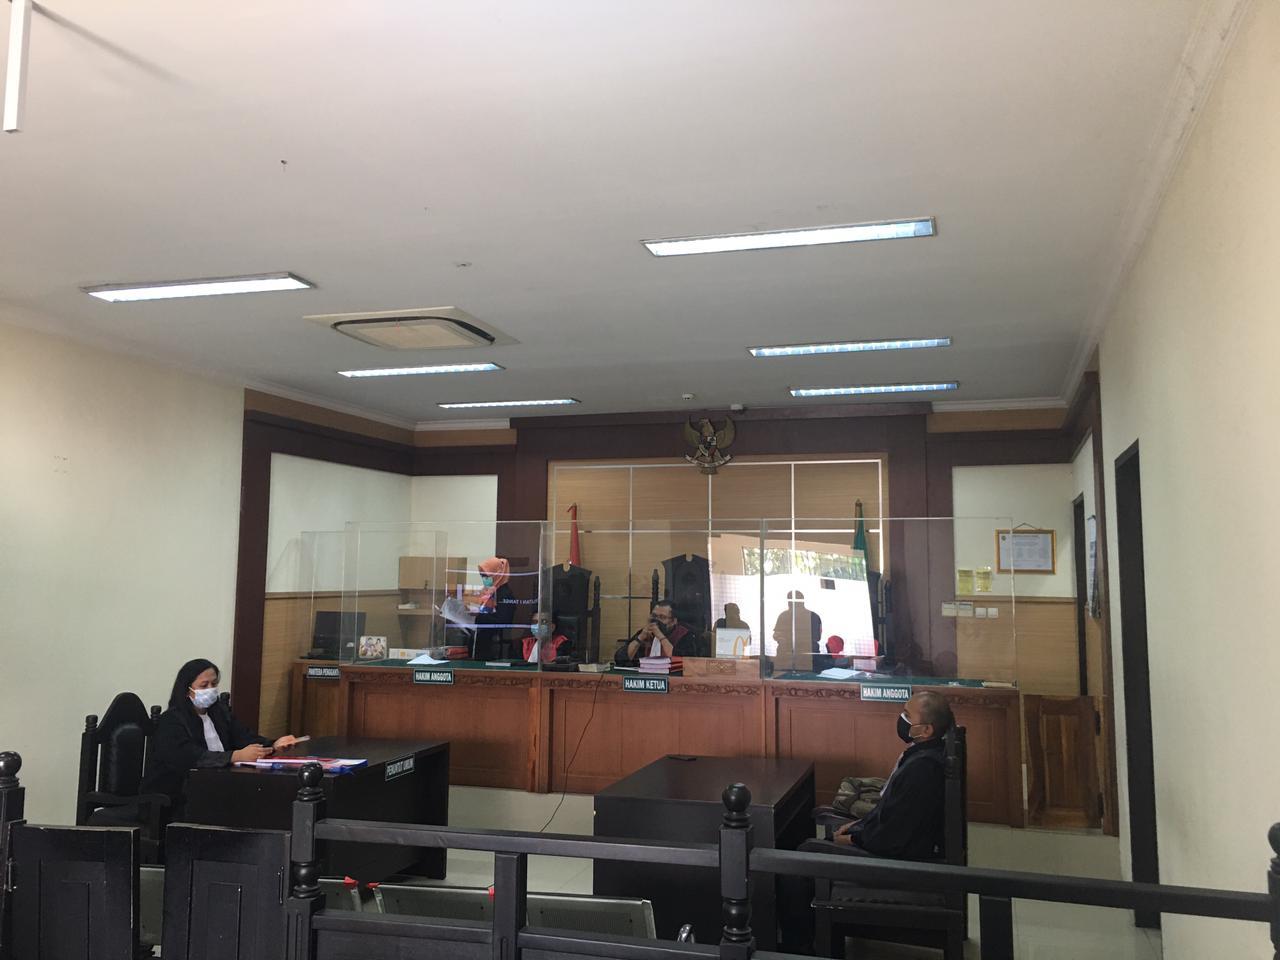 Jaksa Tuntut Terdakwa Penipuan Apartemen 10 Tahun Penjara dan Denda 2 Miliar